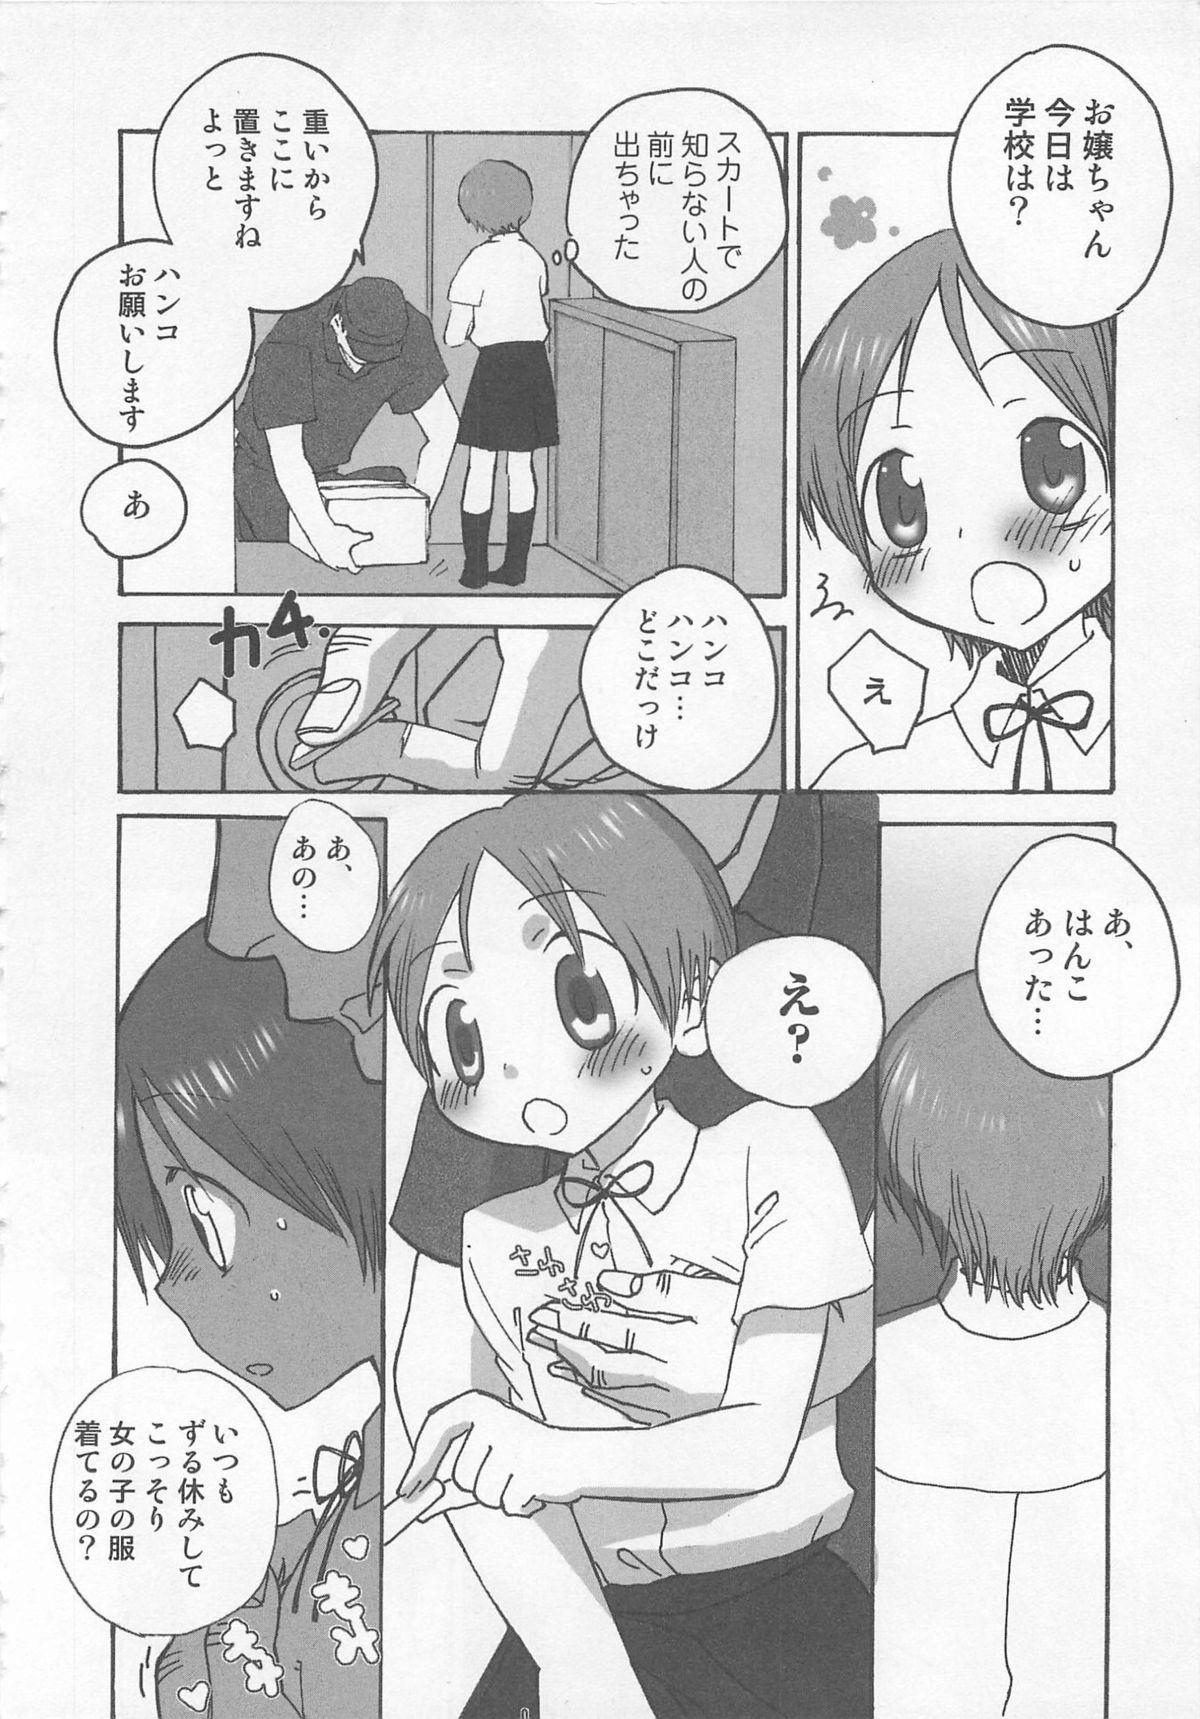 Otokonoko HEAVEN Vol. 02 Dokidoki Chikan Taiken 32